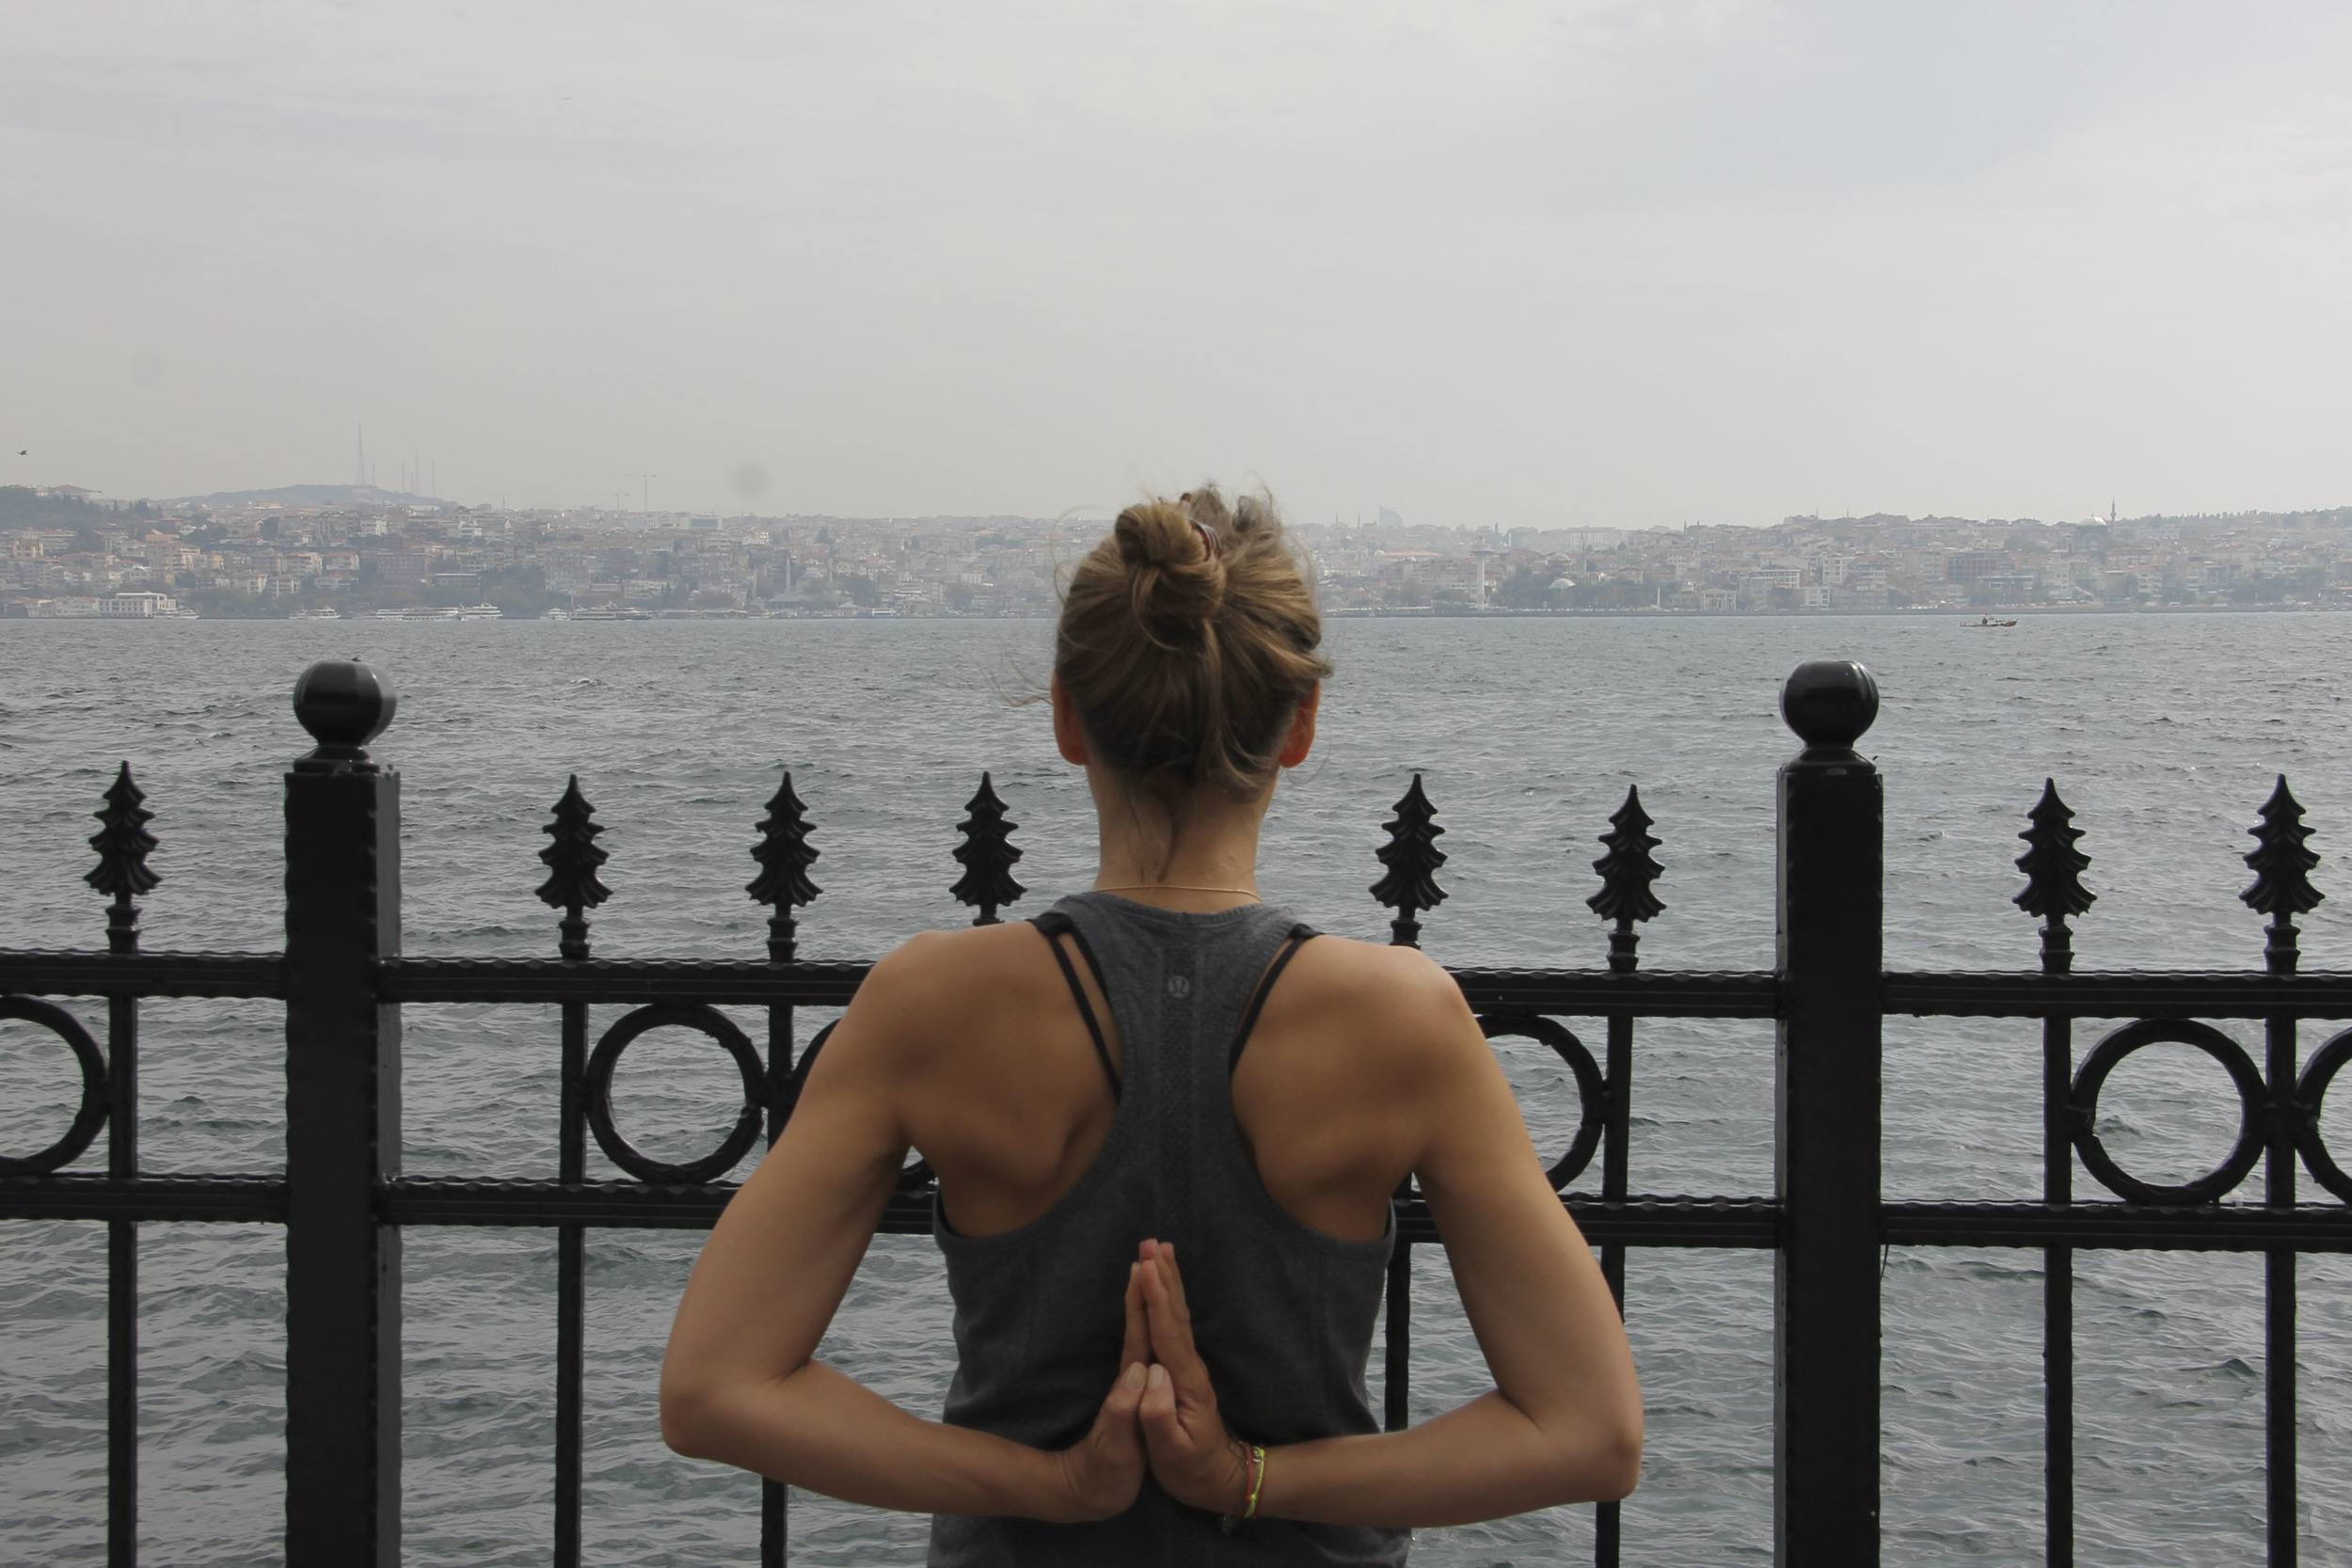 Istanbul, ygatonic on tour, Turkey yoga in istanbul2226.jpg